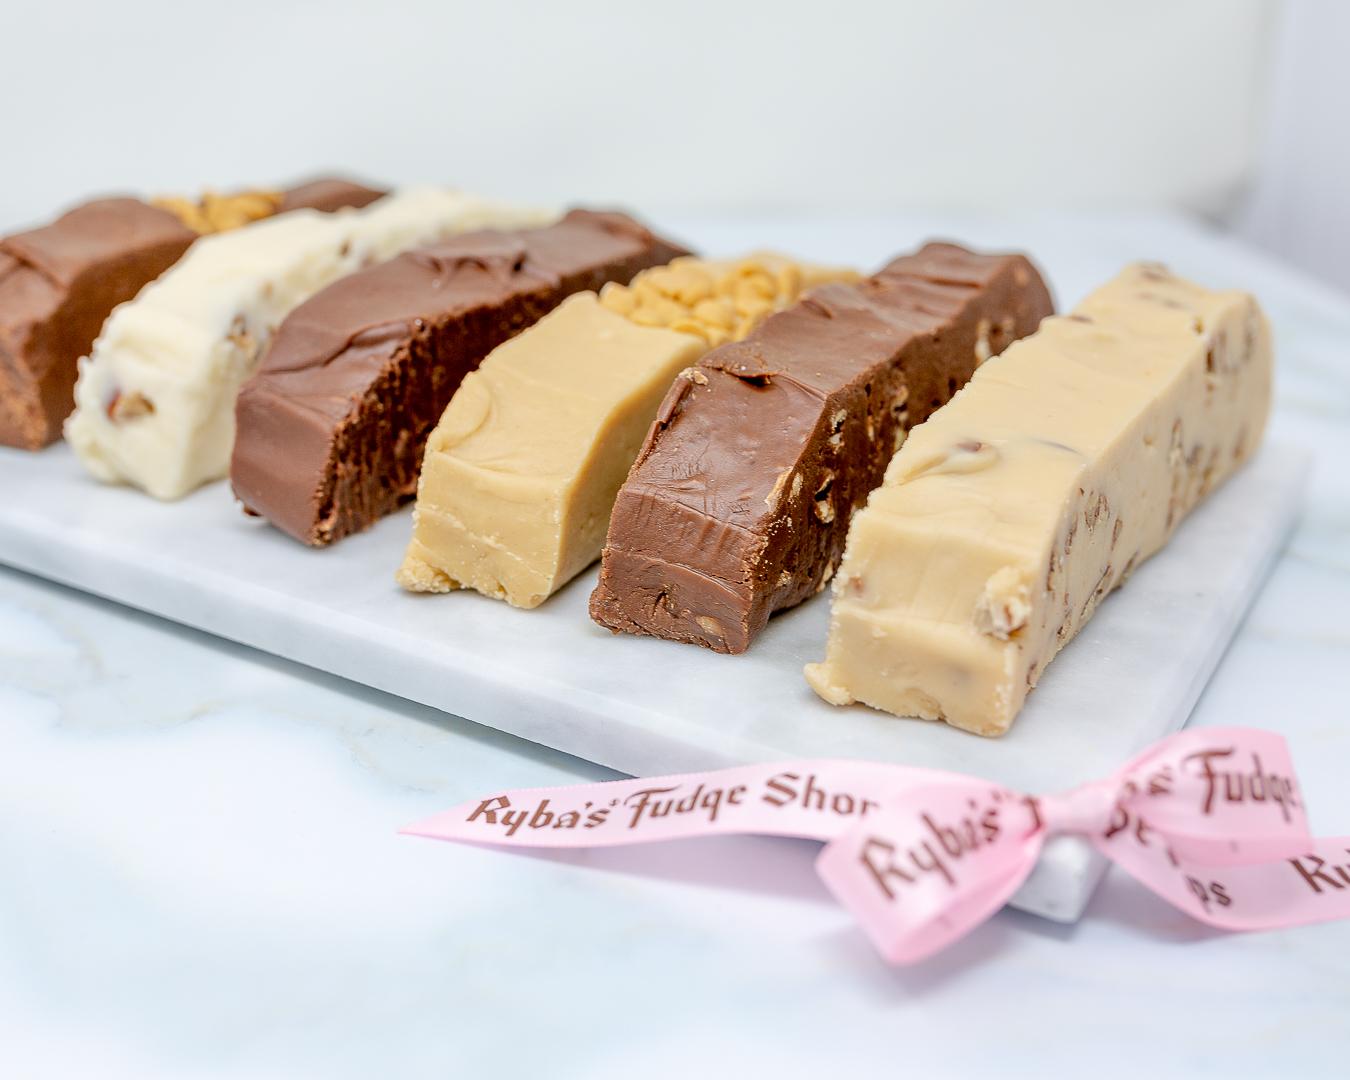 Ryba's Fudge Shops Mackinac Island Fudge